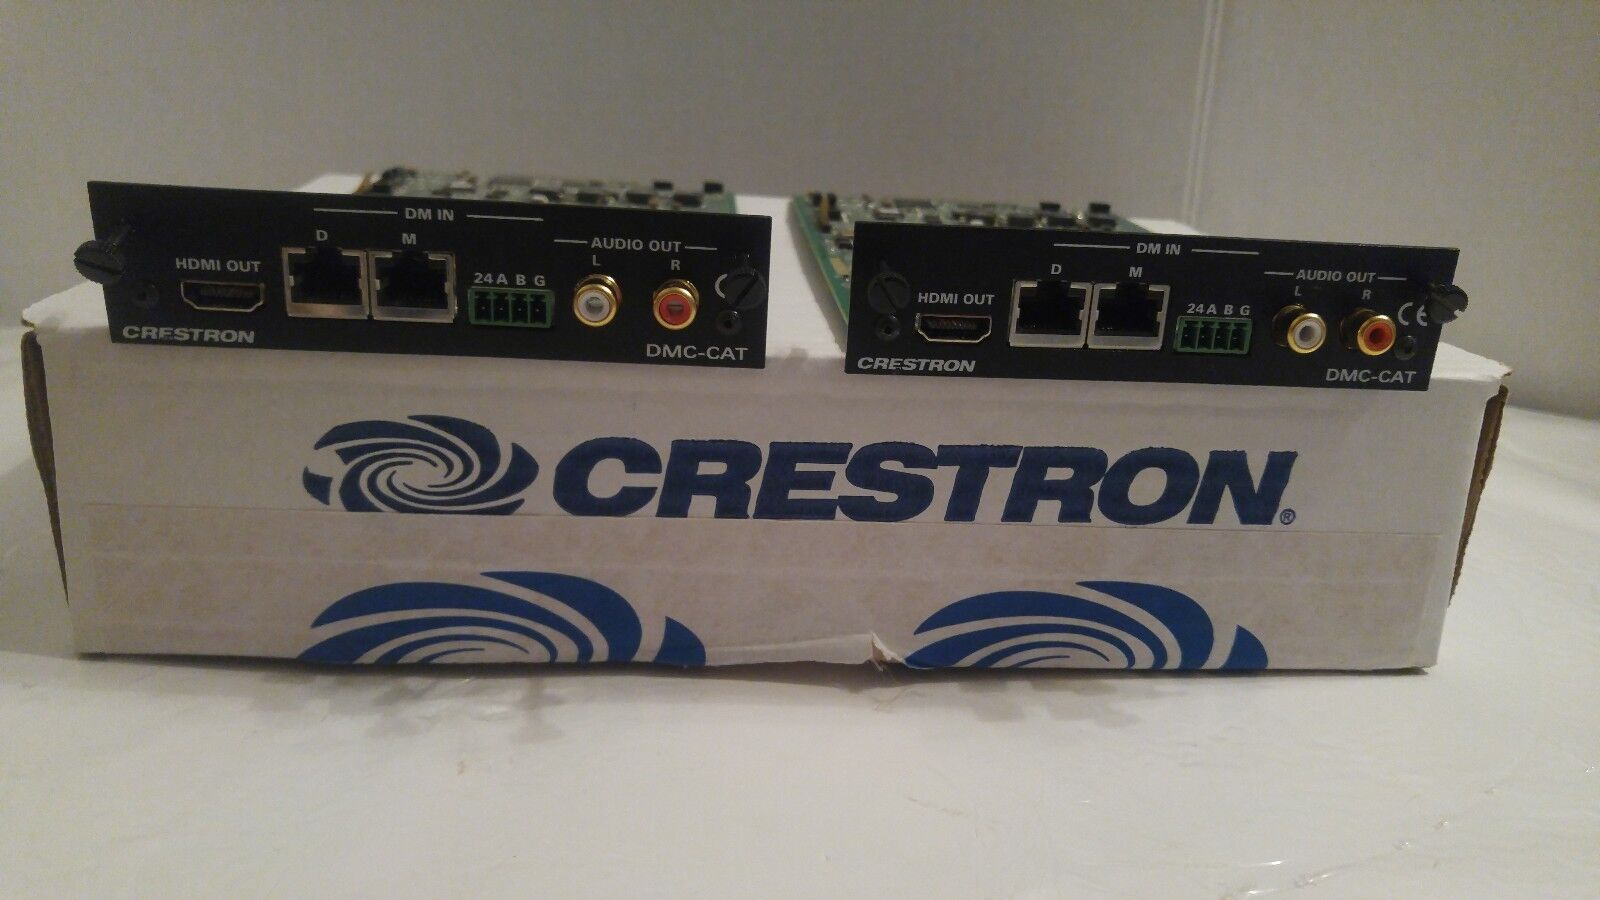 Lot of 2 CRESTRON DMC-CAT DigitalMedia CAT Input Card for DM Switchers UNTESTED